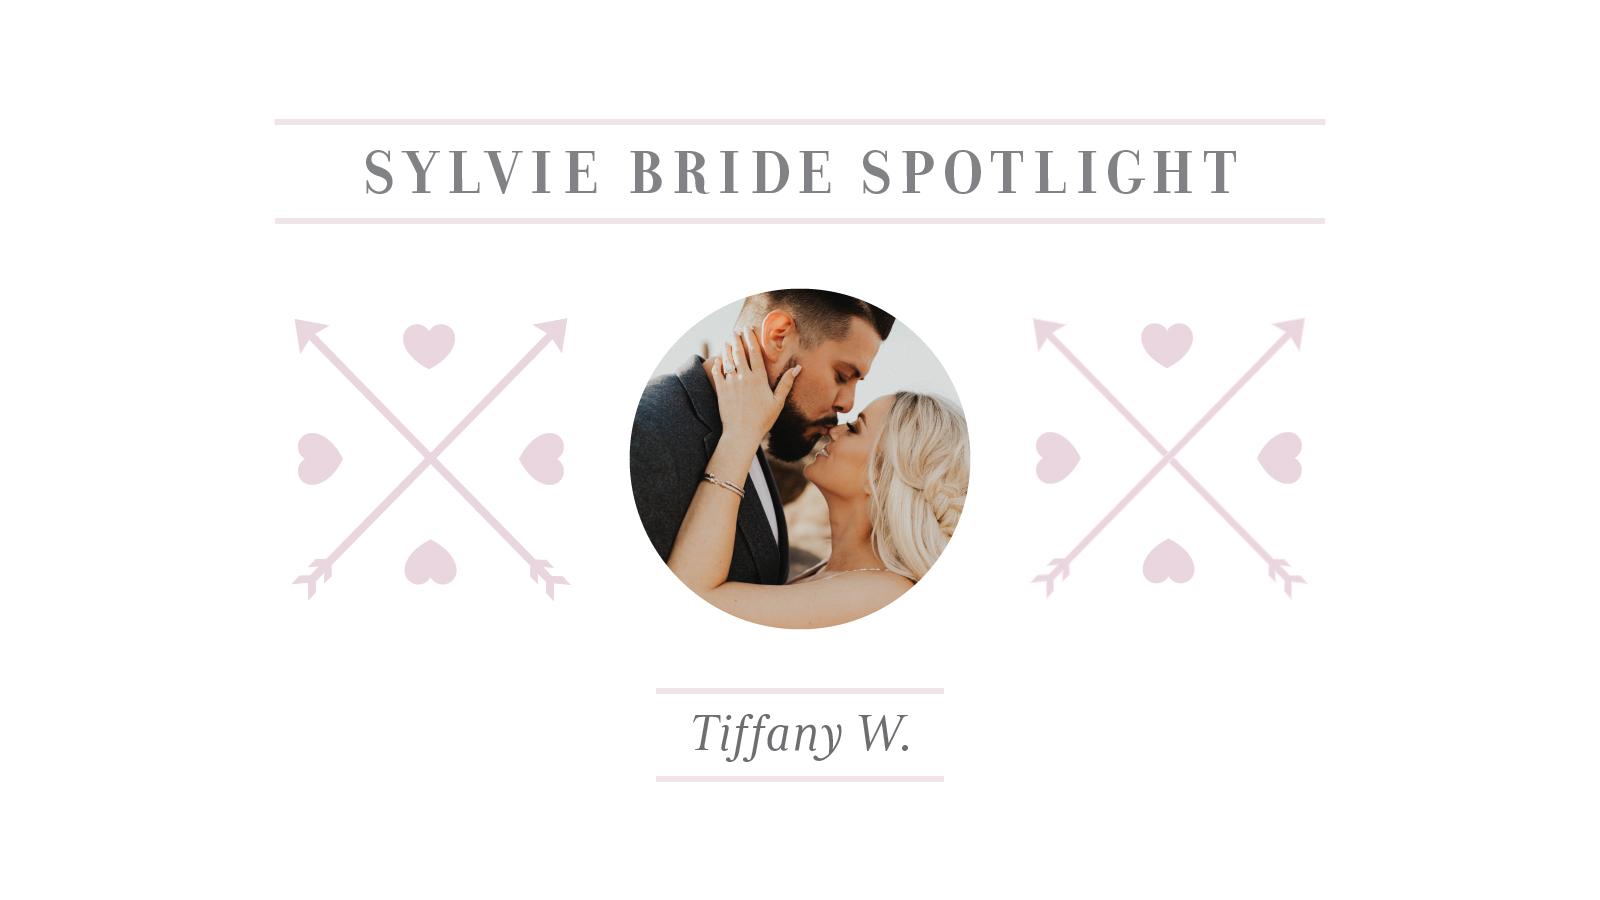 Sylvie Bride Spotlight - TiffanyW